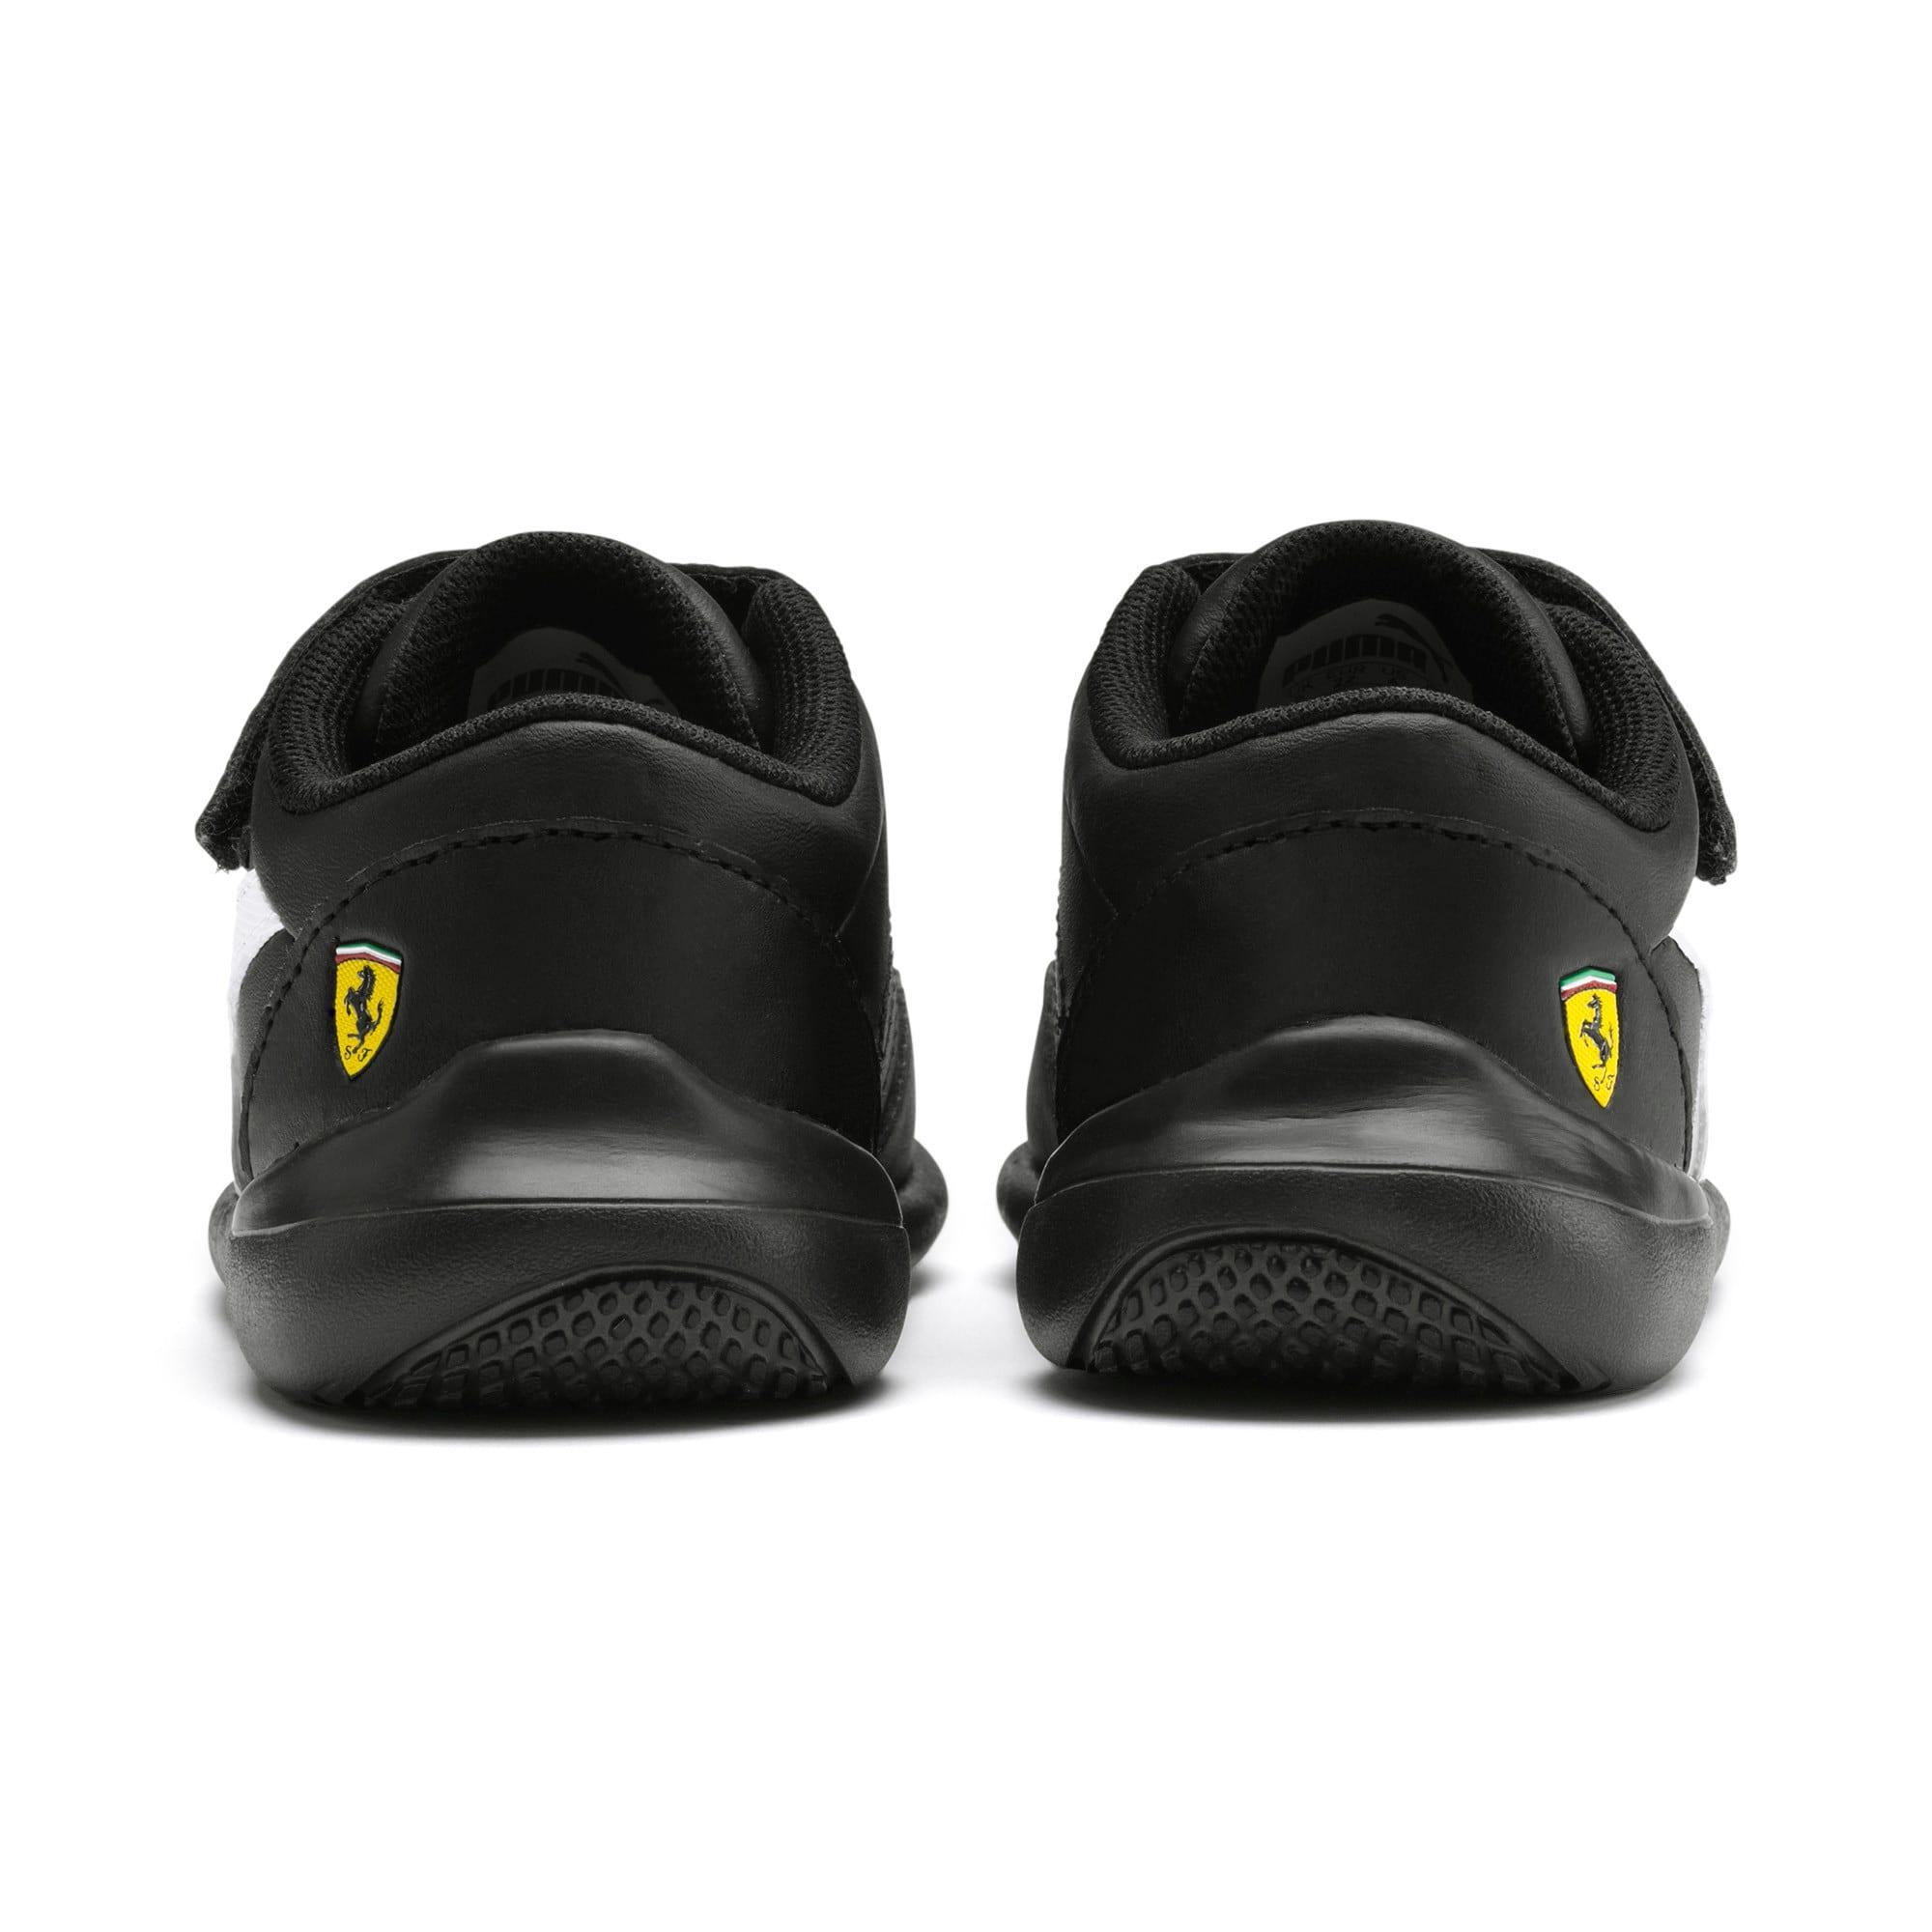 Thumbnail 3 of Scuderia Ferrari Kart Cat III Toddler Shoes, Black-White-Blazing Yellow, medium